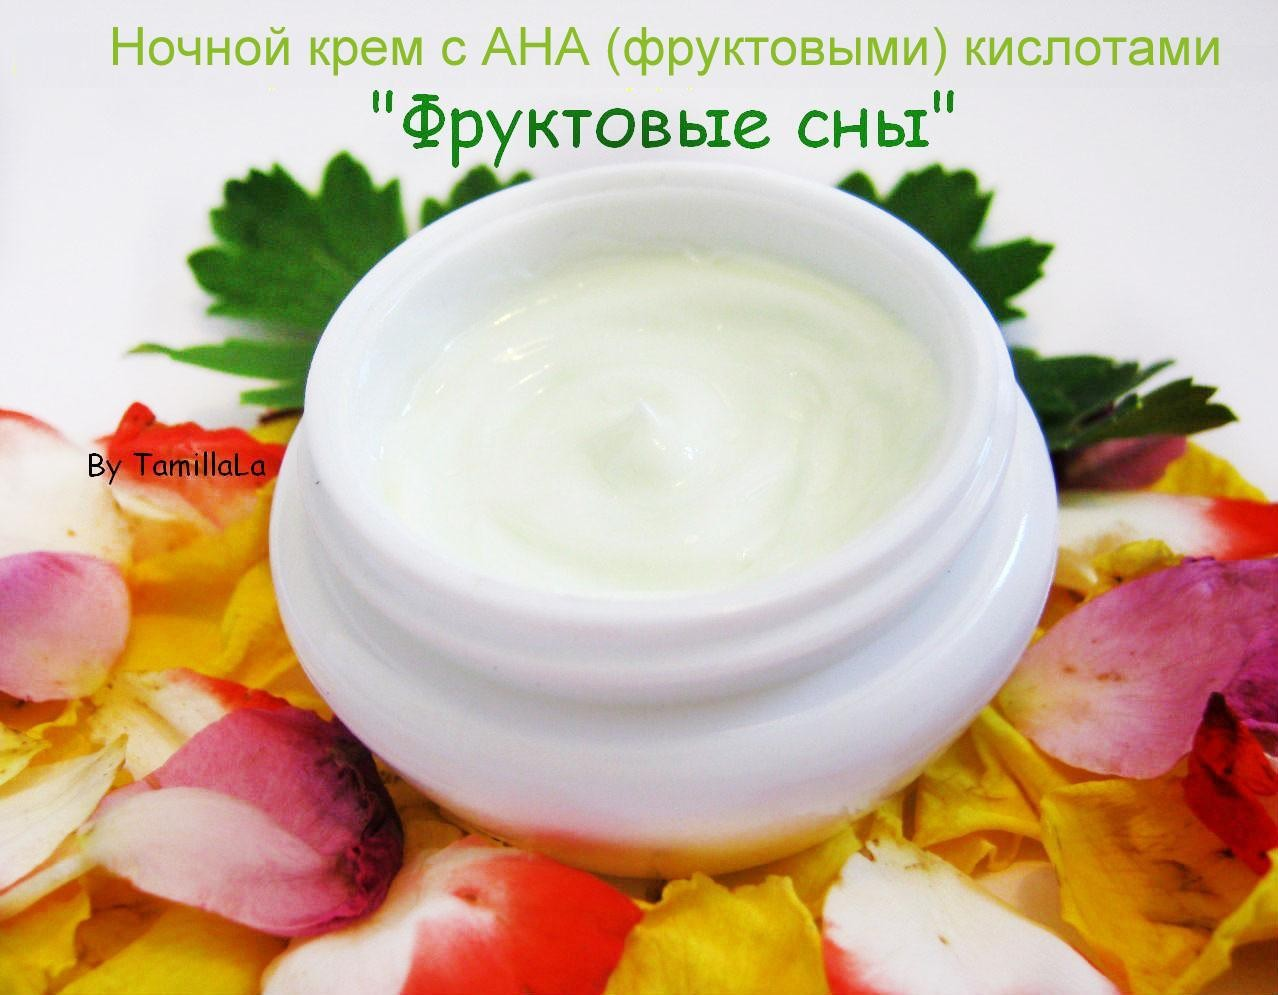 Bio-Viktorika Крем ночной с АНА кислотами для любого типа кожи